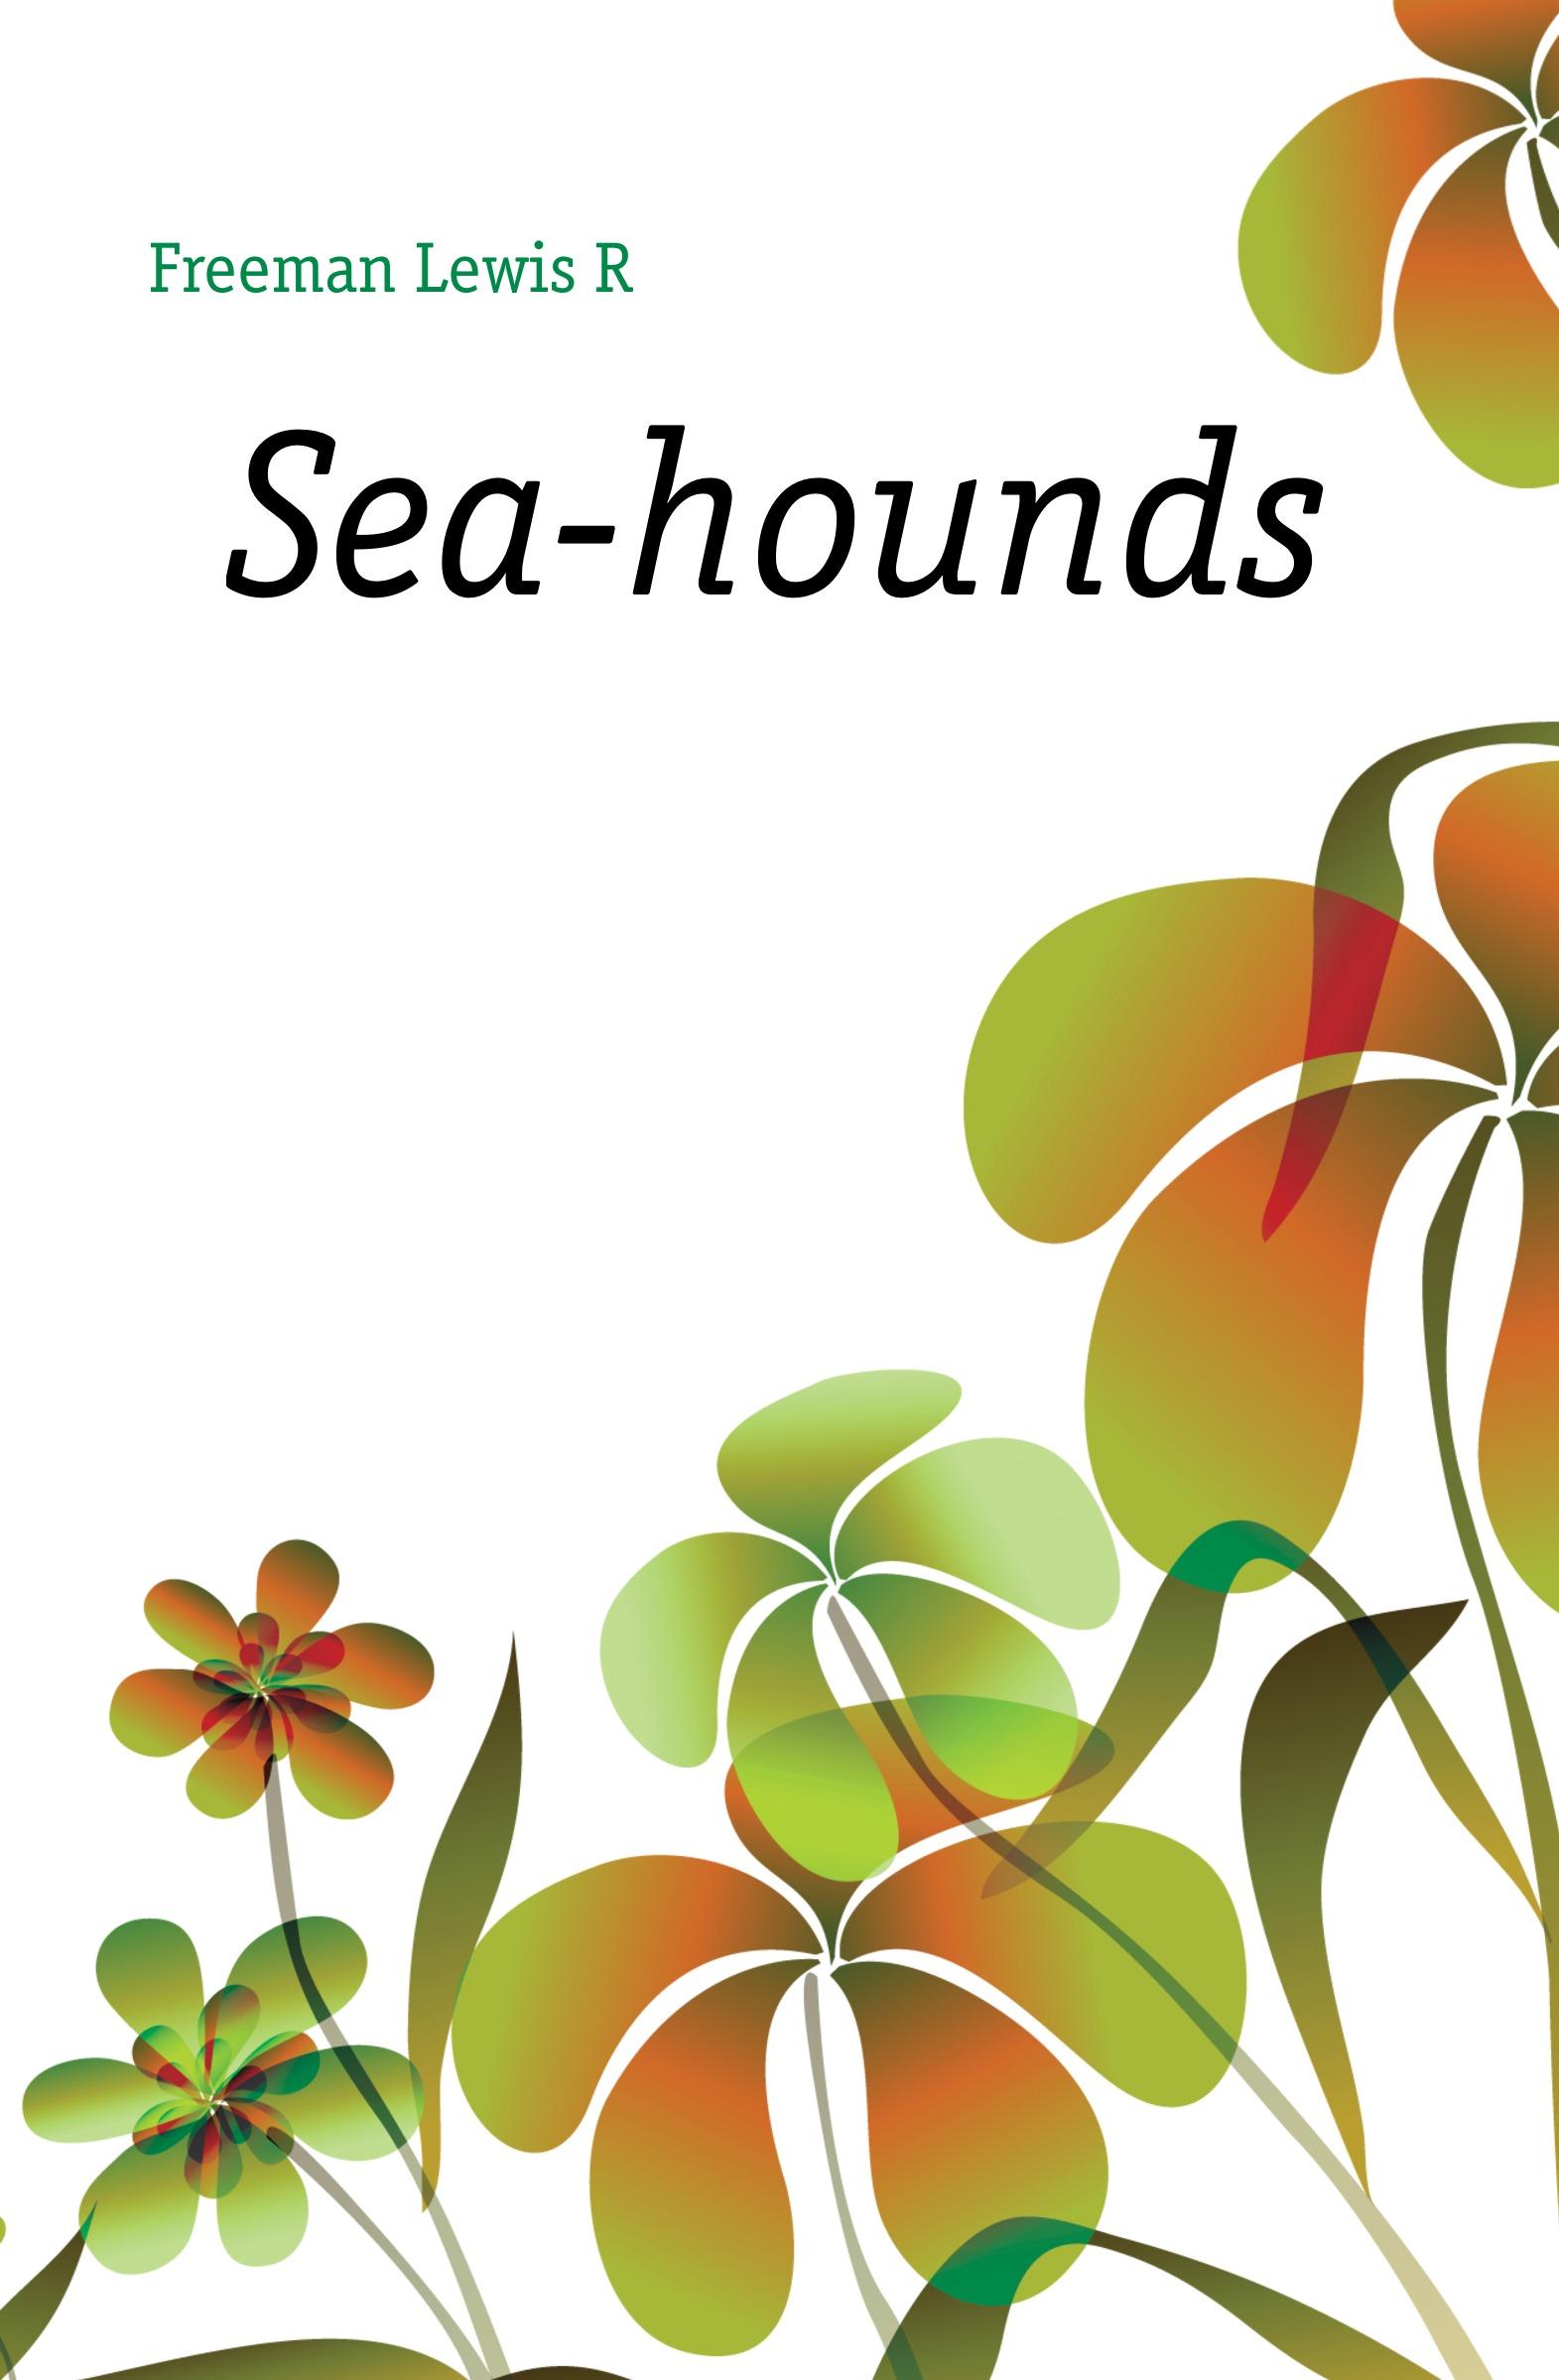 Freeman Lewis R. Sea-hounds r austin freeman osirise silm